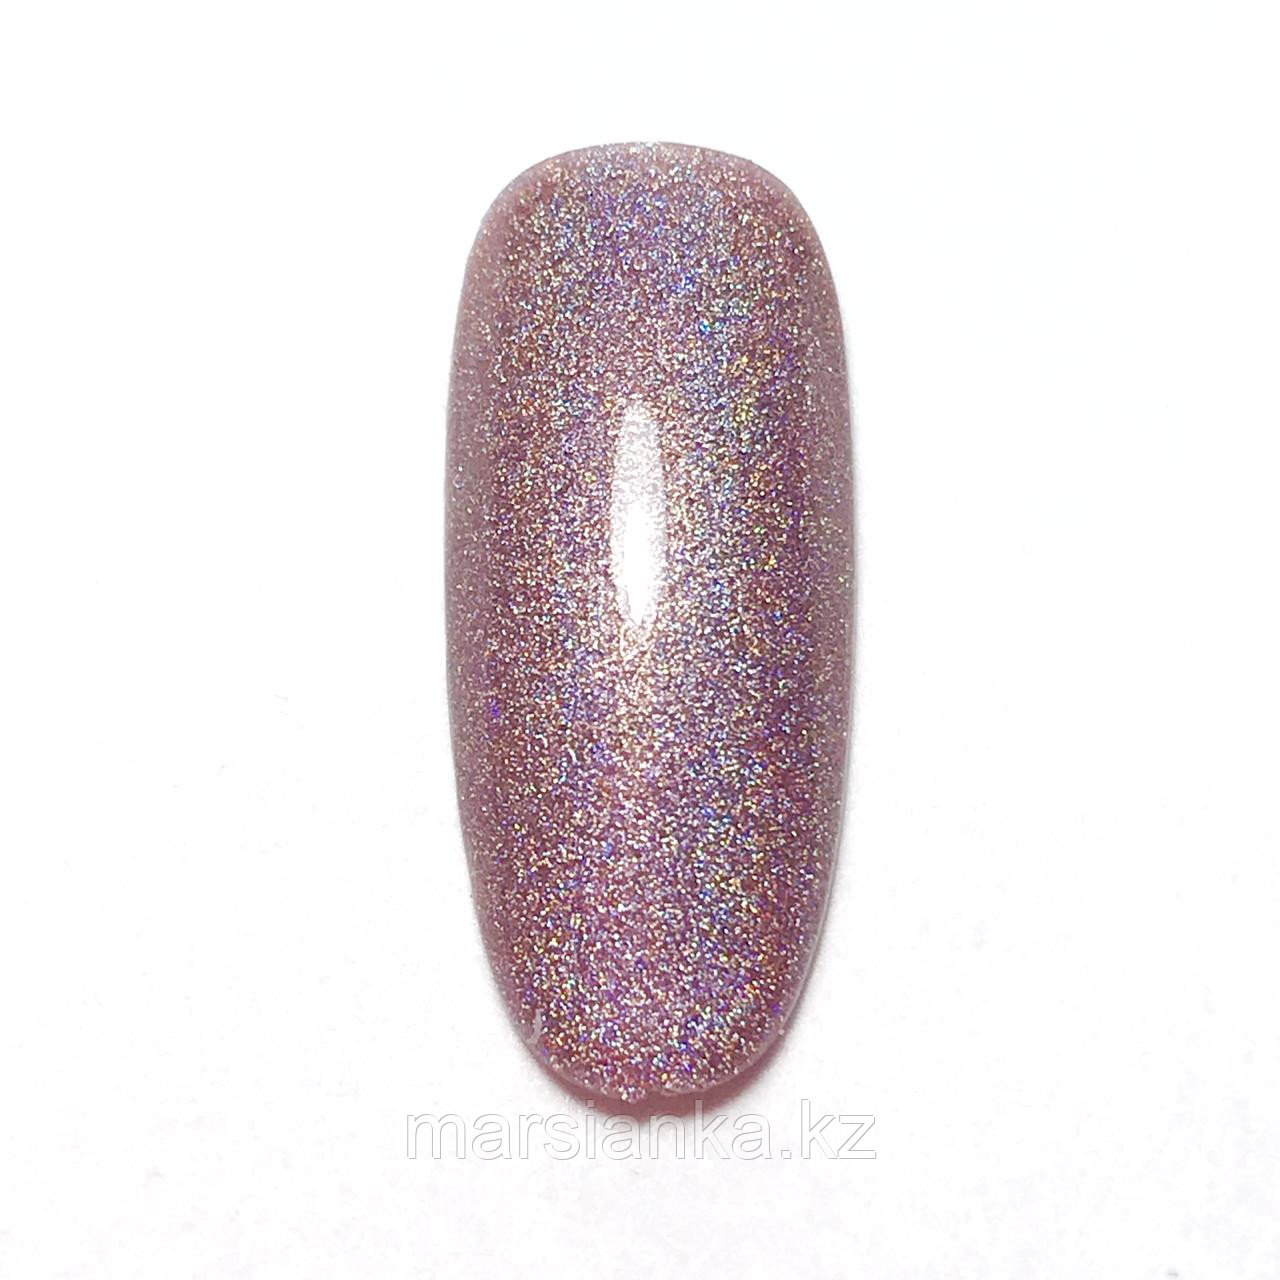 Гель лак Nail Best Prisma 04, 10мл